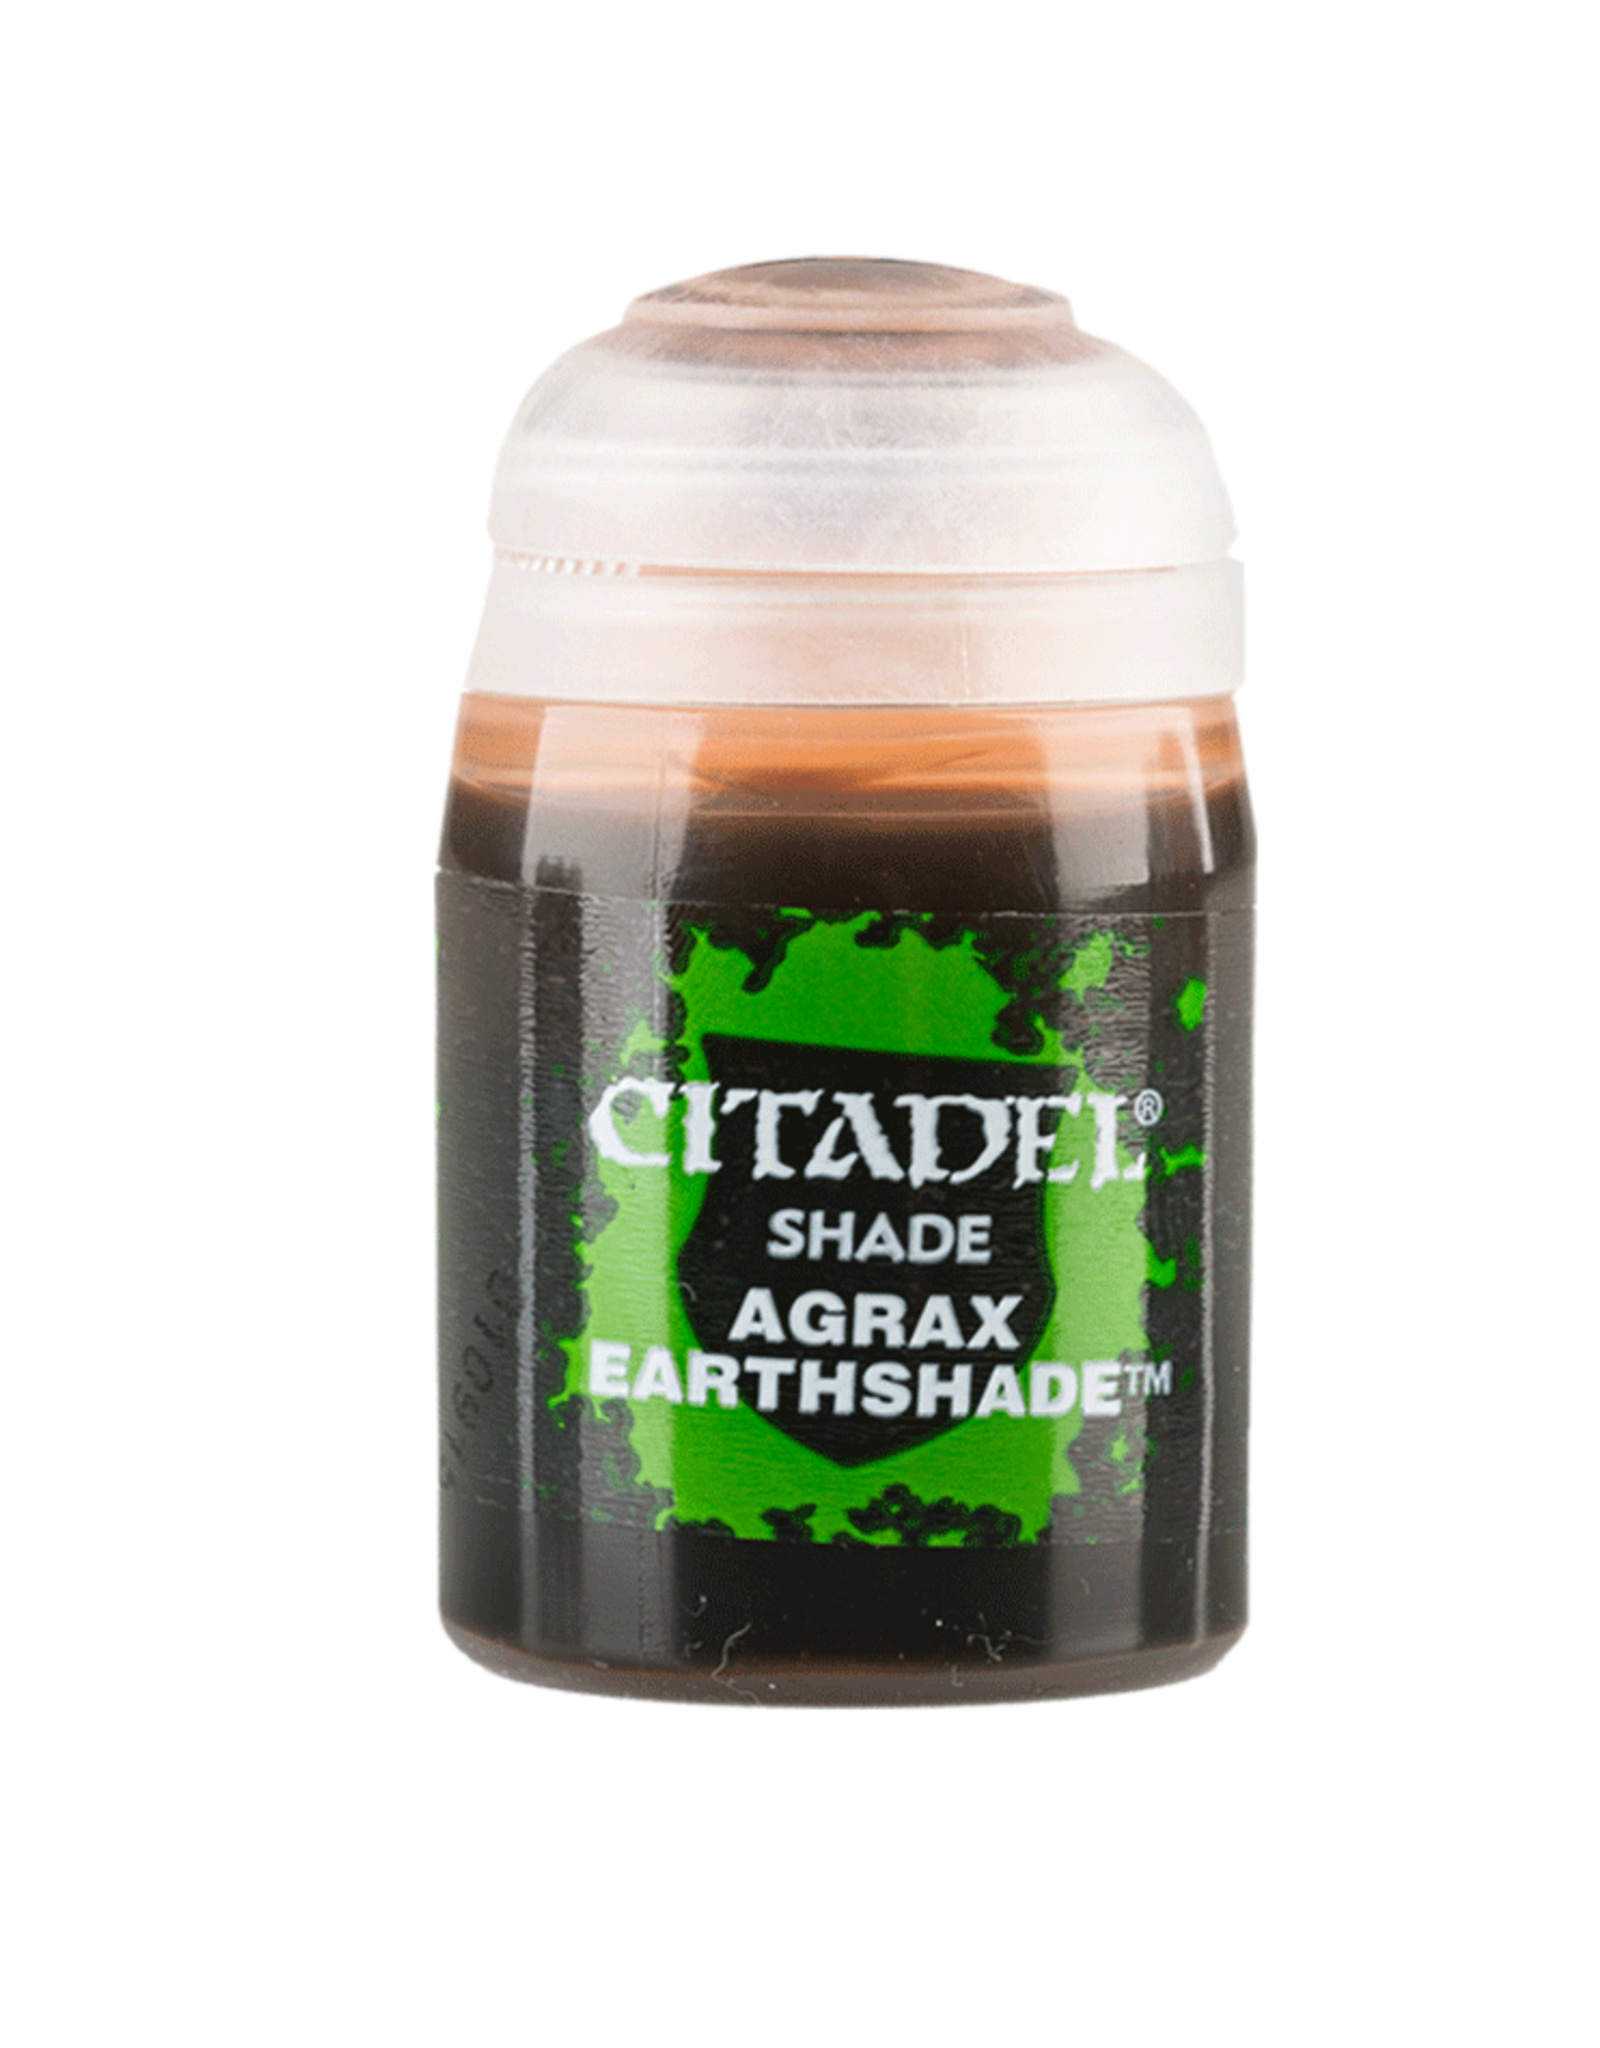 Games Workshop Citadel Shade: Agrax Earthshade (24ml)